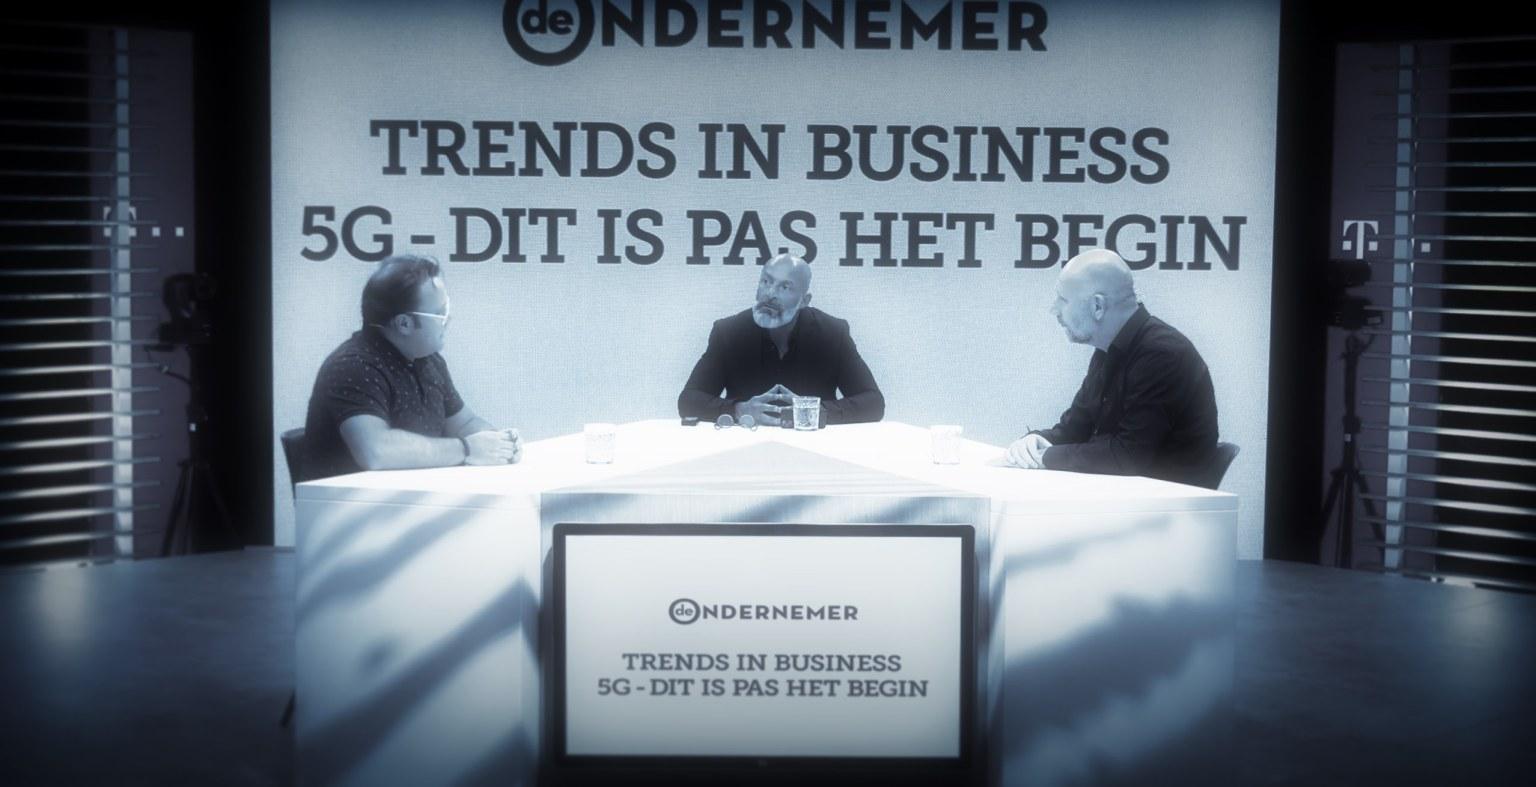 Trends In Business Aflevering 2